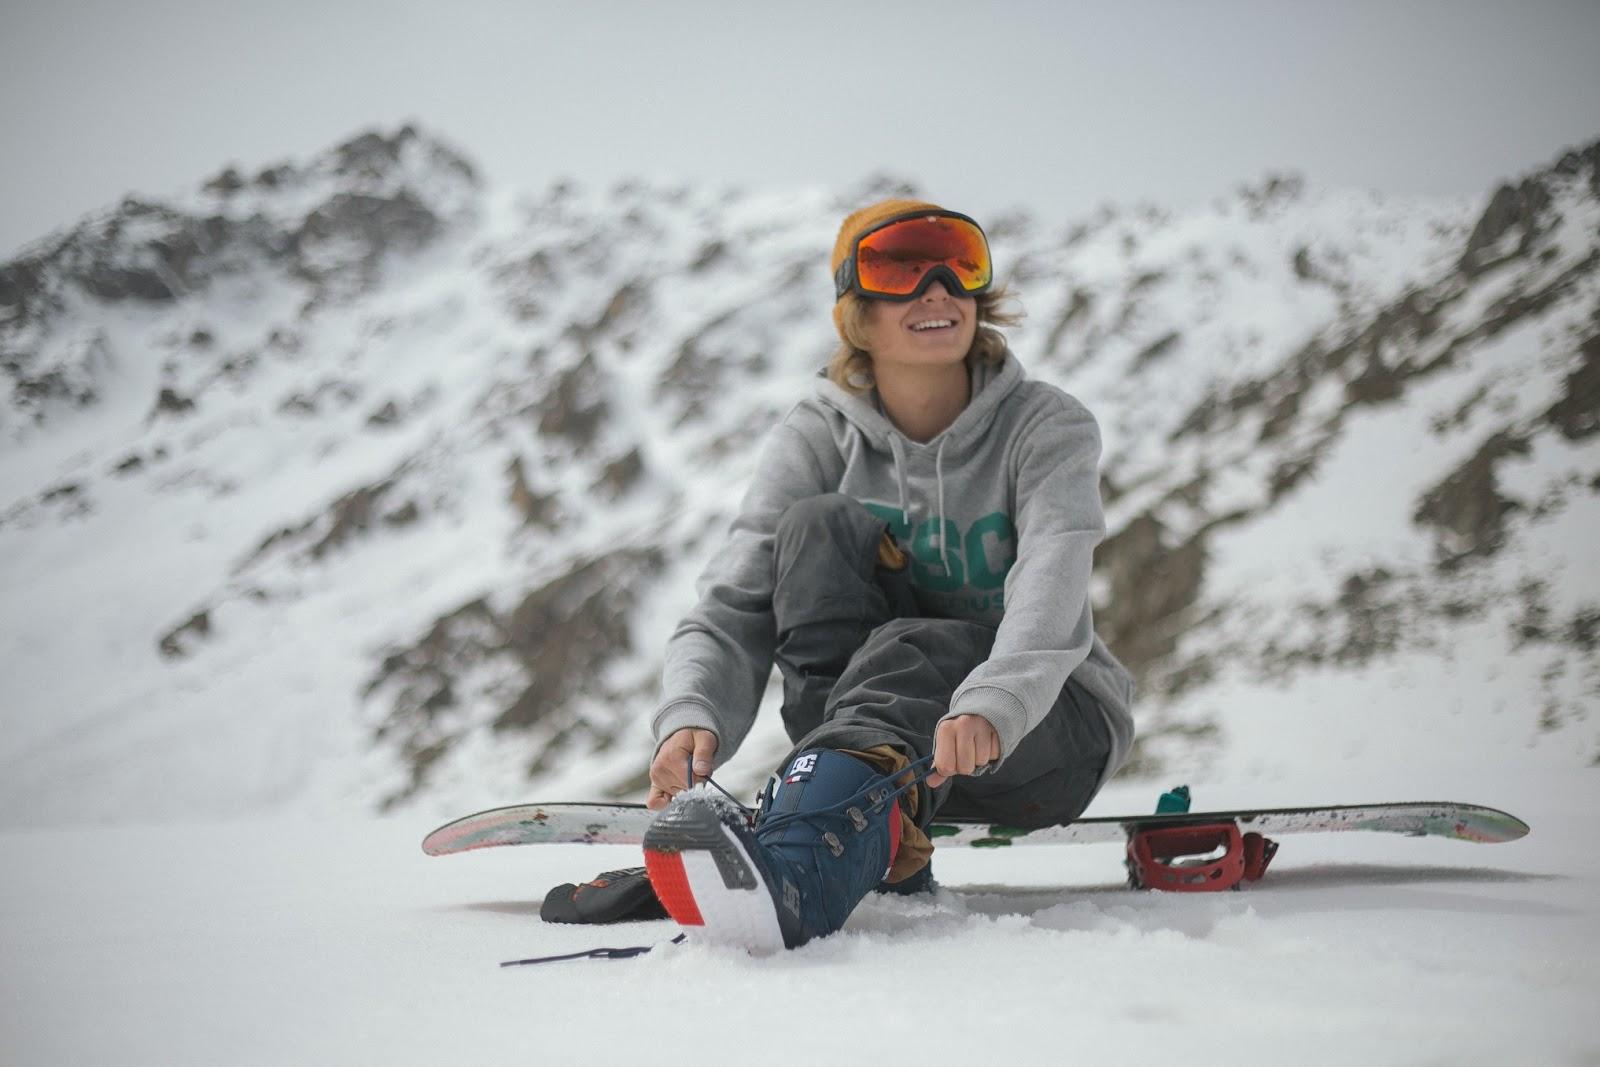 Man Snowboard - Quiksilver